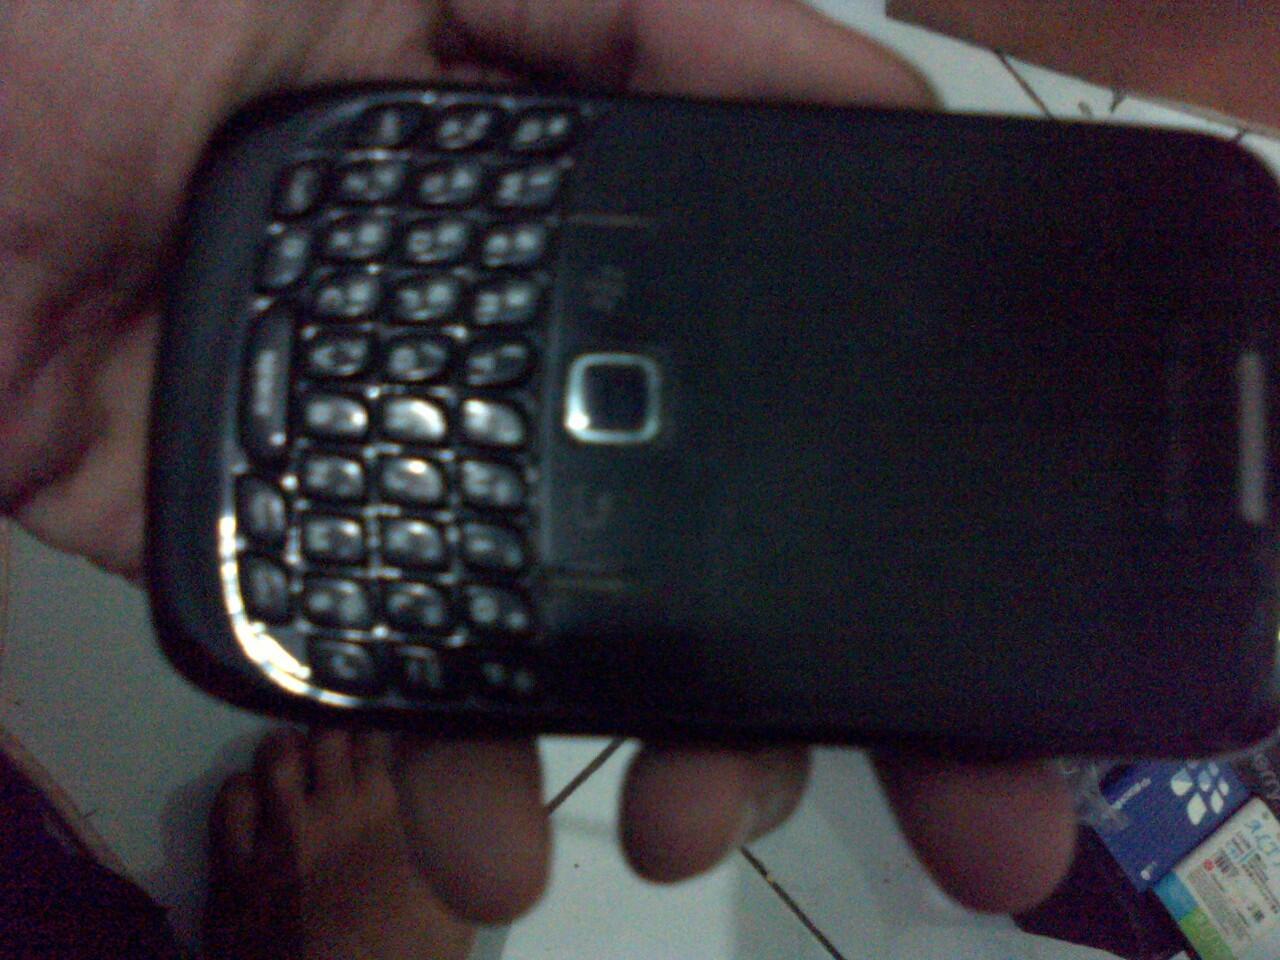 Blackberry gemini cdma (aries) hitam 8530